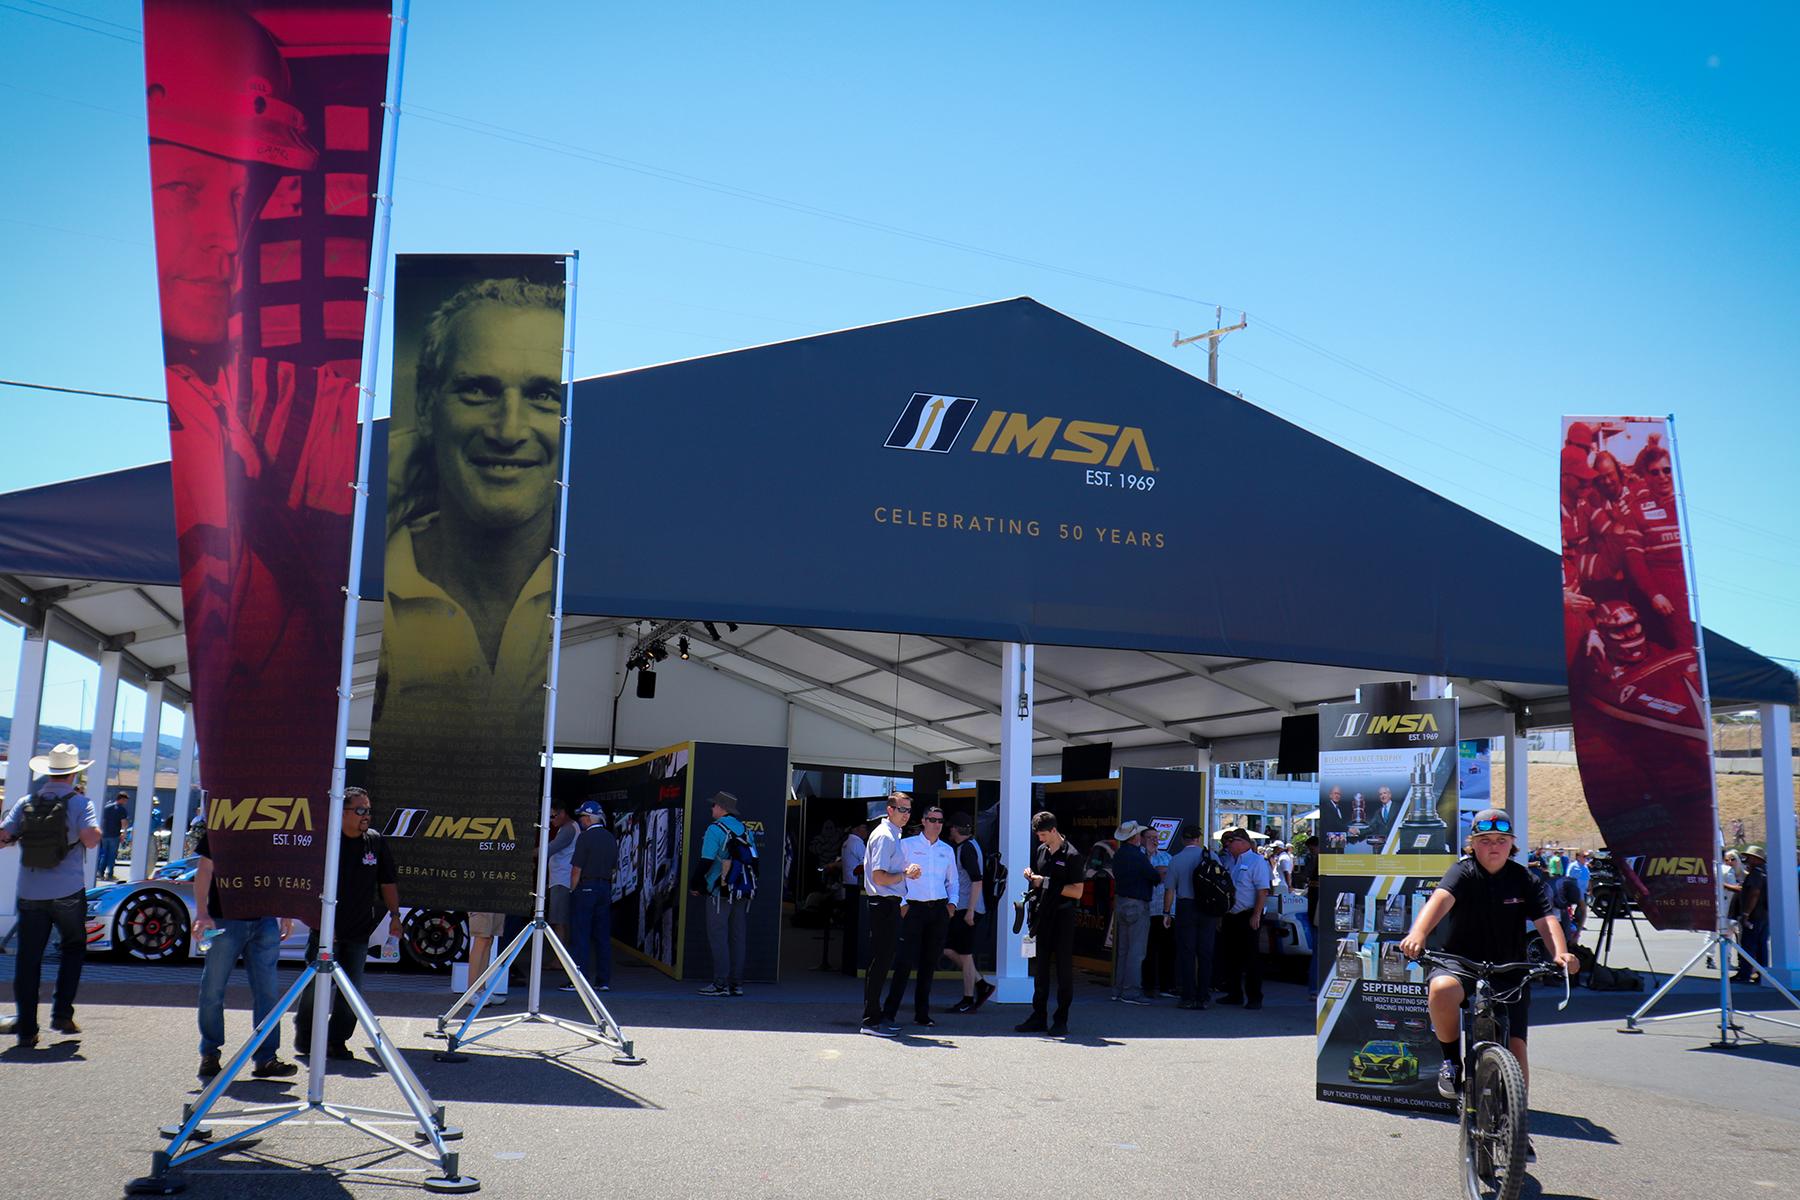 Centigrade - Celebrating IMSA at Rolex Monterey Motorsports Reunion